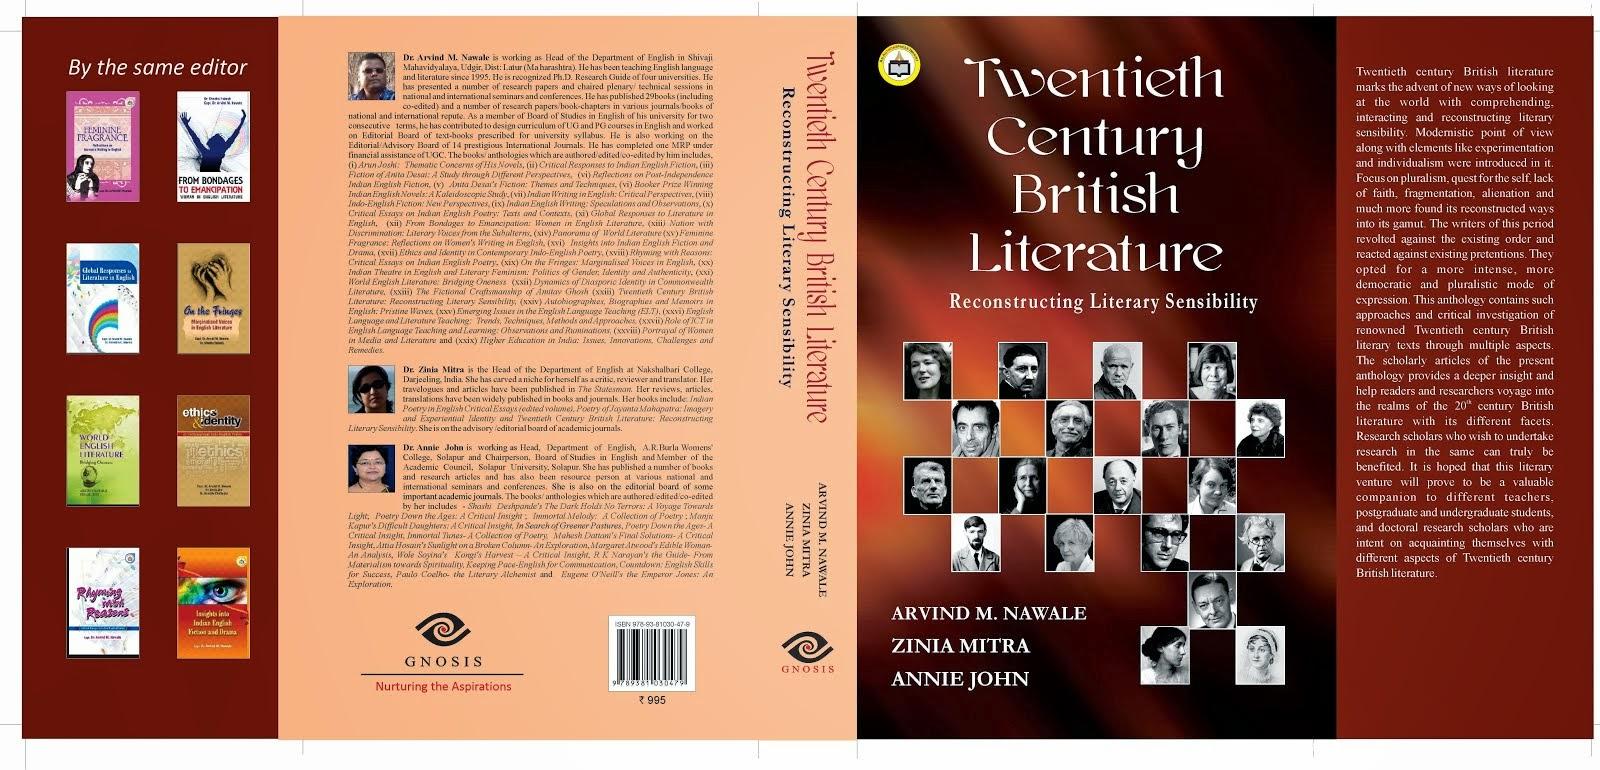 Twentieth Century British Literature: Reconstructing Literary Sensibility